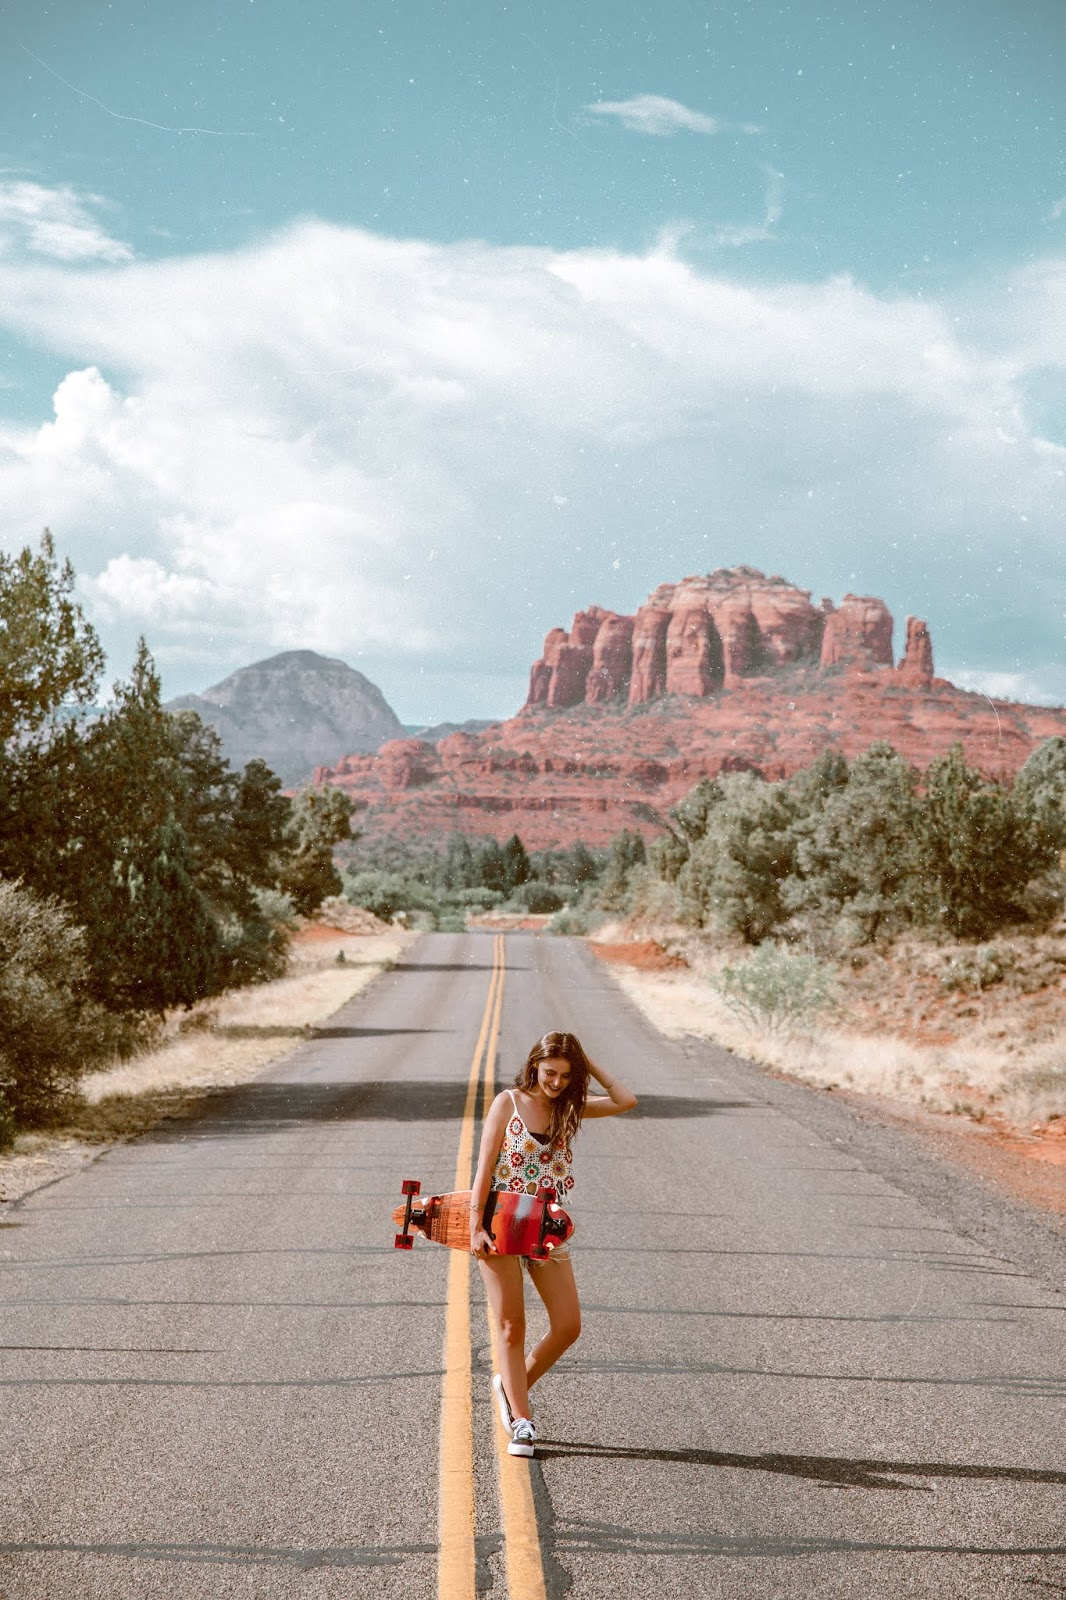 Shelly Stuckman, ArizonaGirl.com, Exodus Longboard Co, longboards, skateboards, longboarding, skateboarding, Sedona, Sedona Red Rocks, Vans